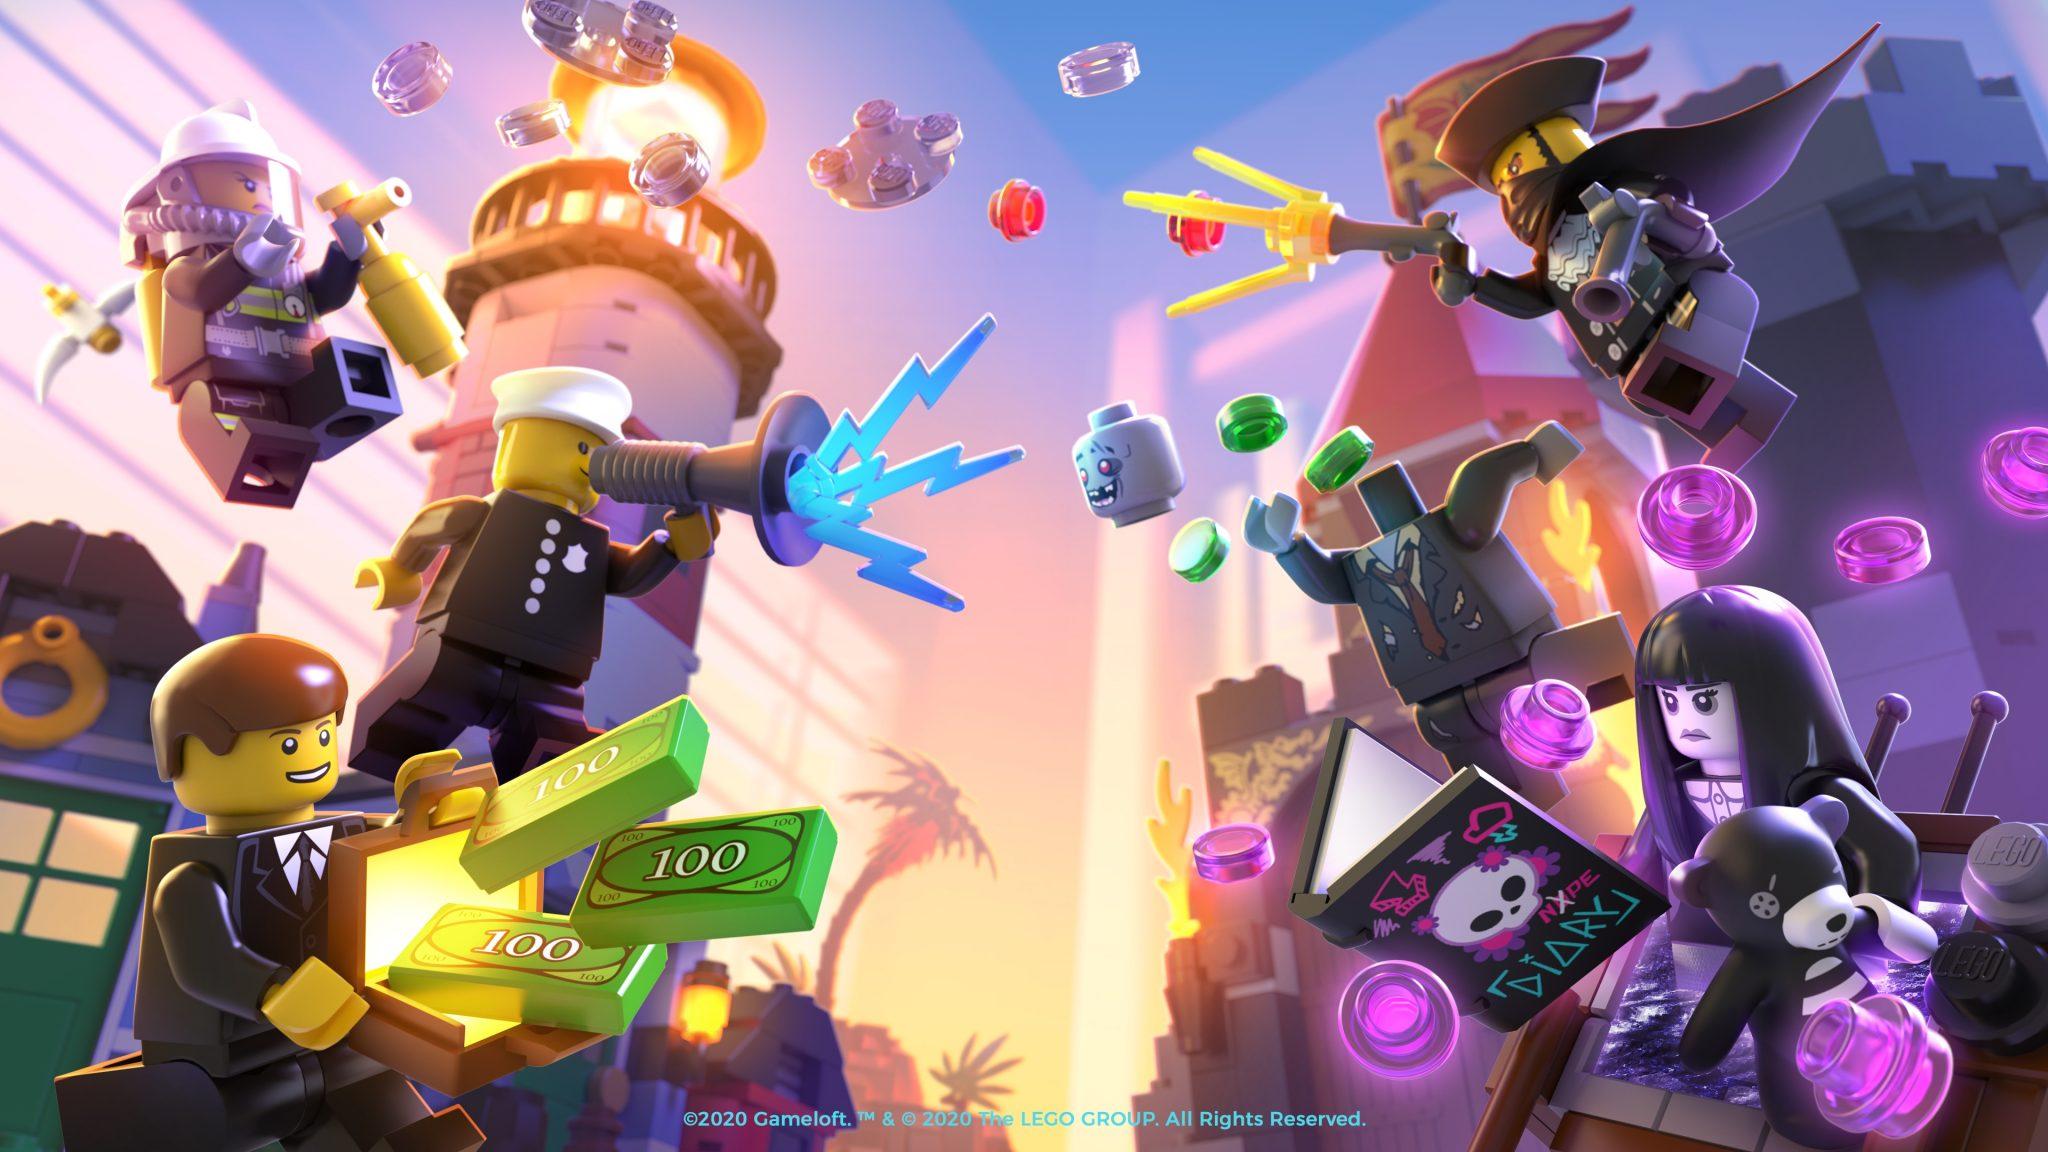 LEGO Legacy: Heroes Unboxed, la nuova avventura RPG con i personaggi LEGO più amati thumbnail